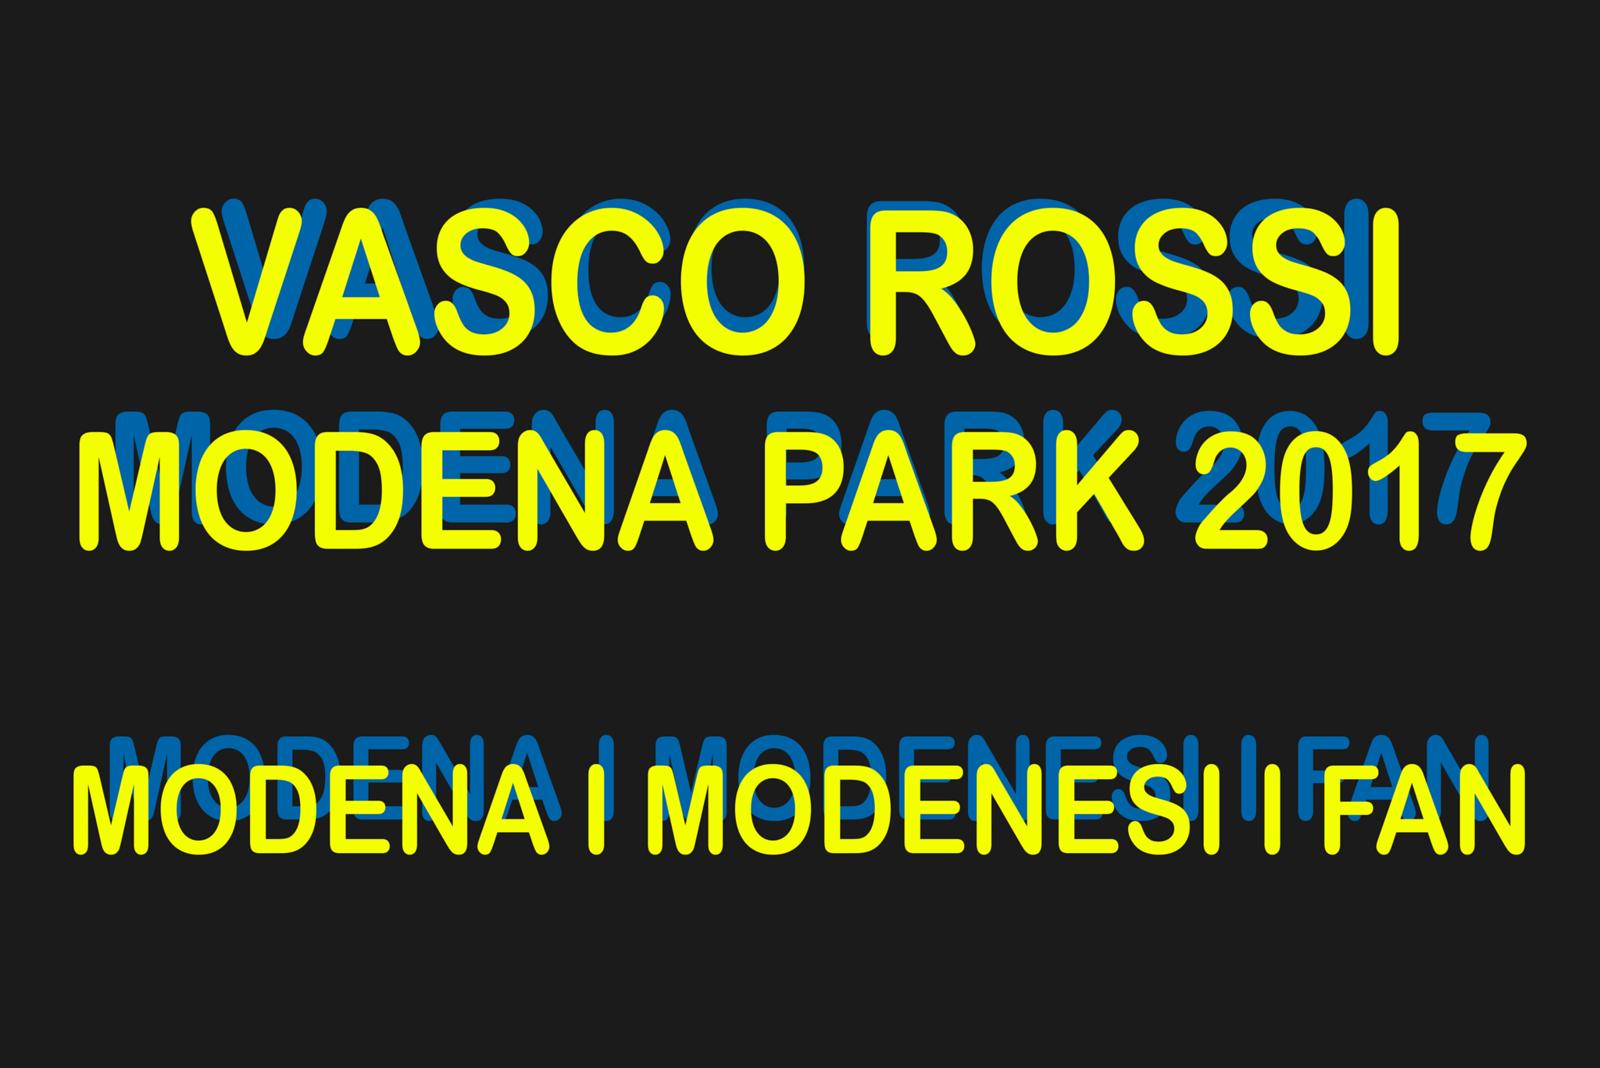 VASCO ROSSI MODENA PARK 2017 MODENA I MODENESI I FAN